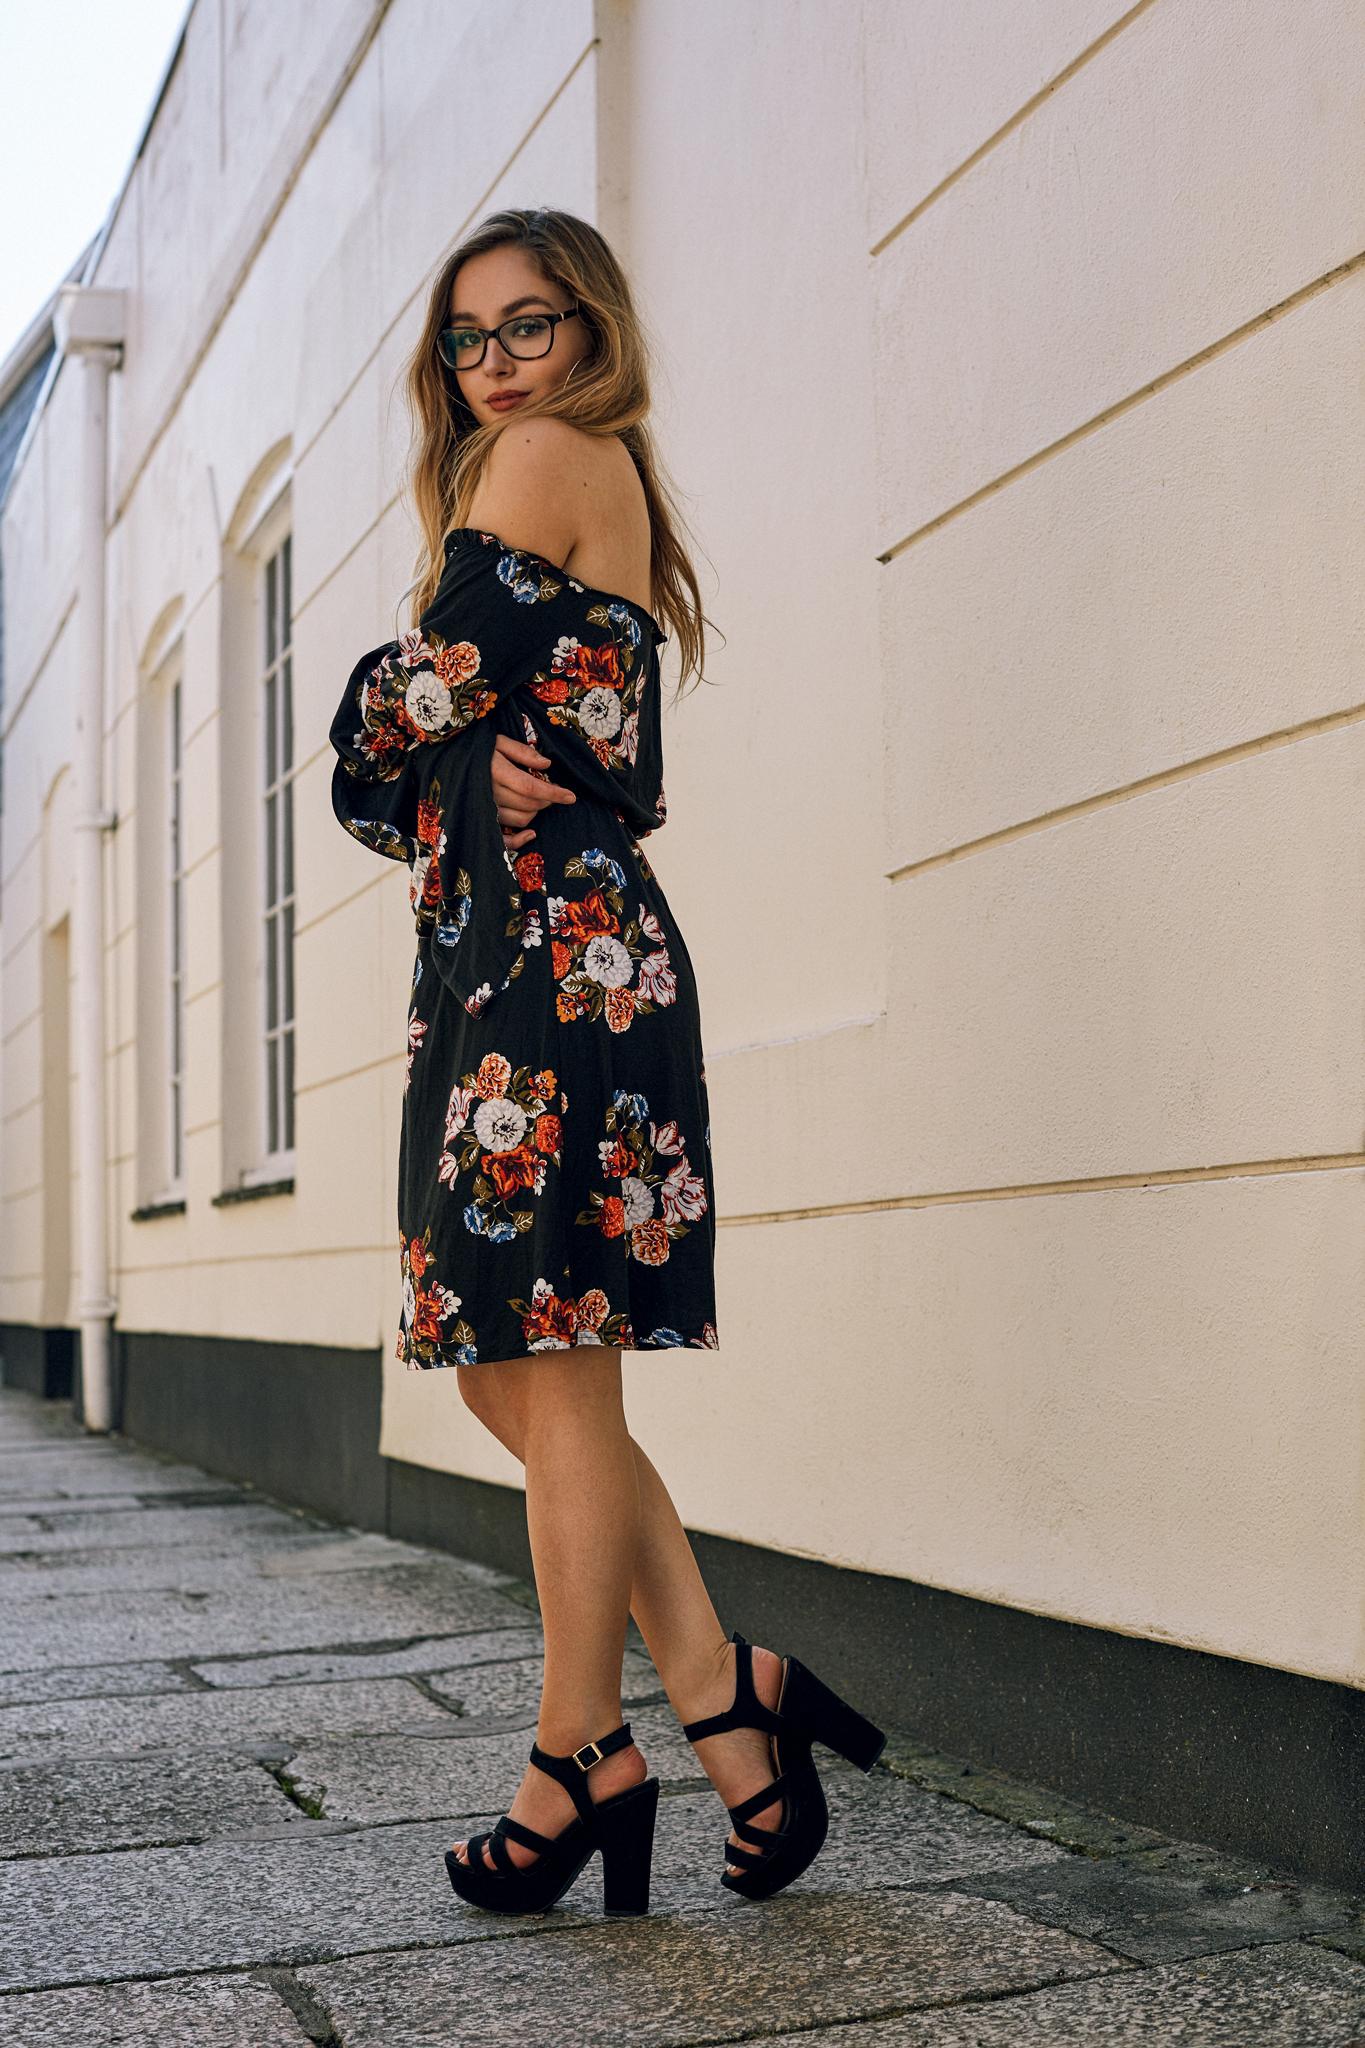 Emily_Fashion_6_Web.jpg